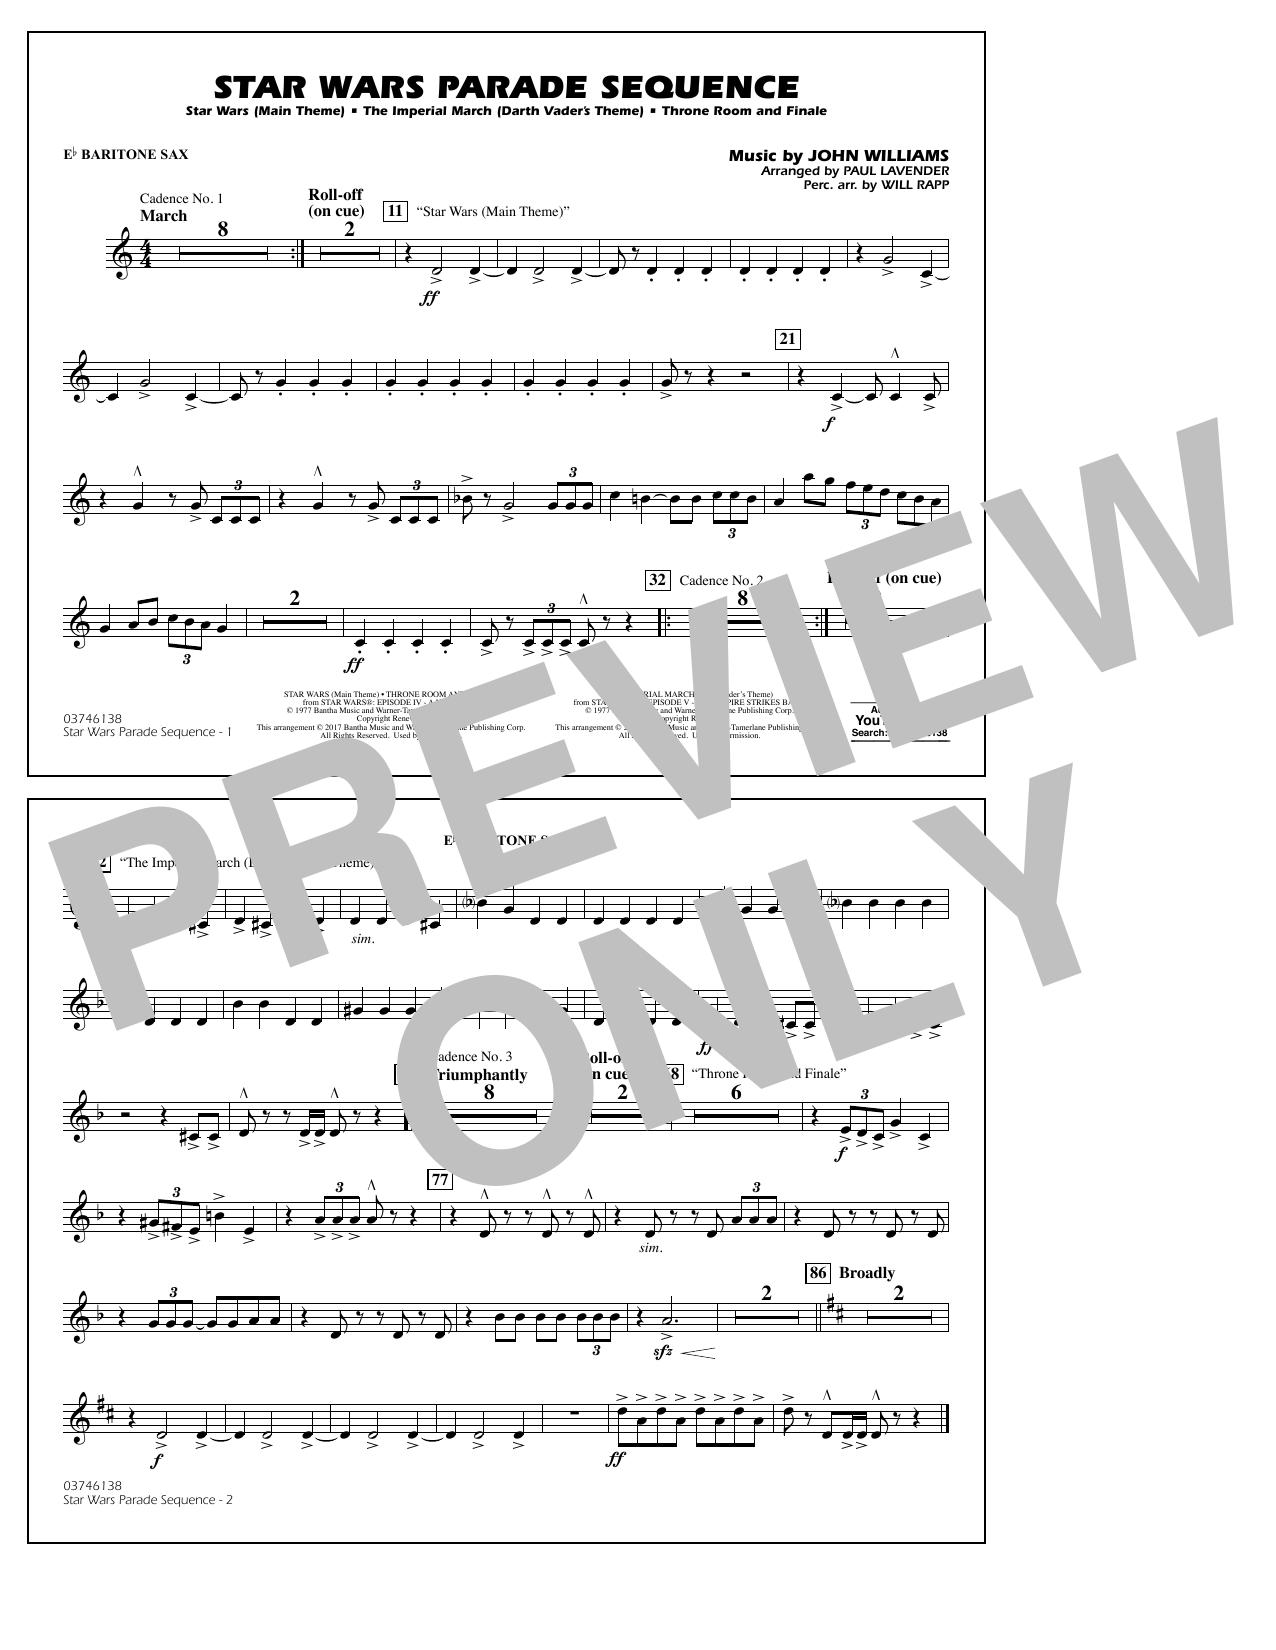 Star Wars Parade Sequence - Eb Baritone Sax Sheet Music